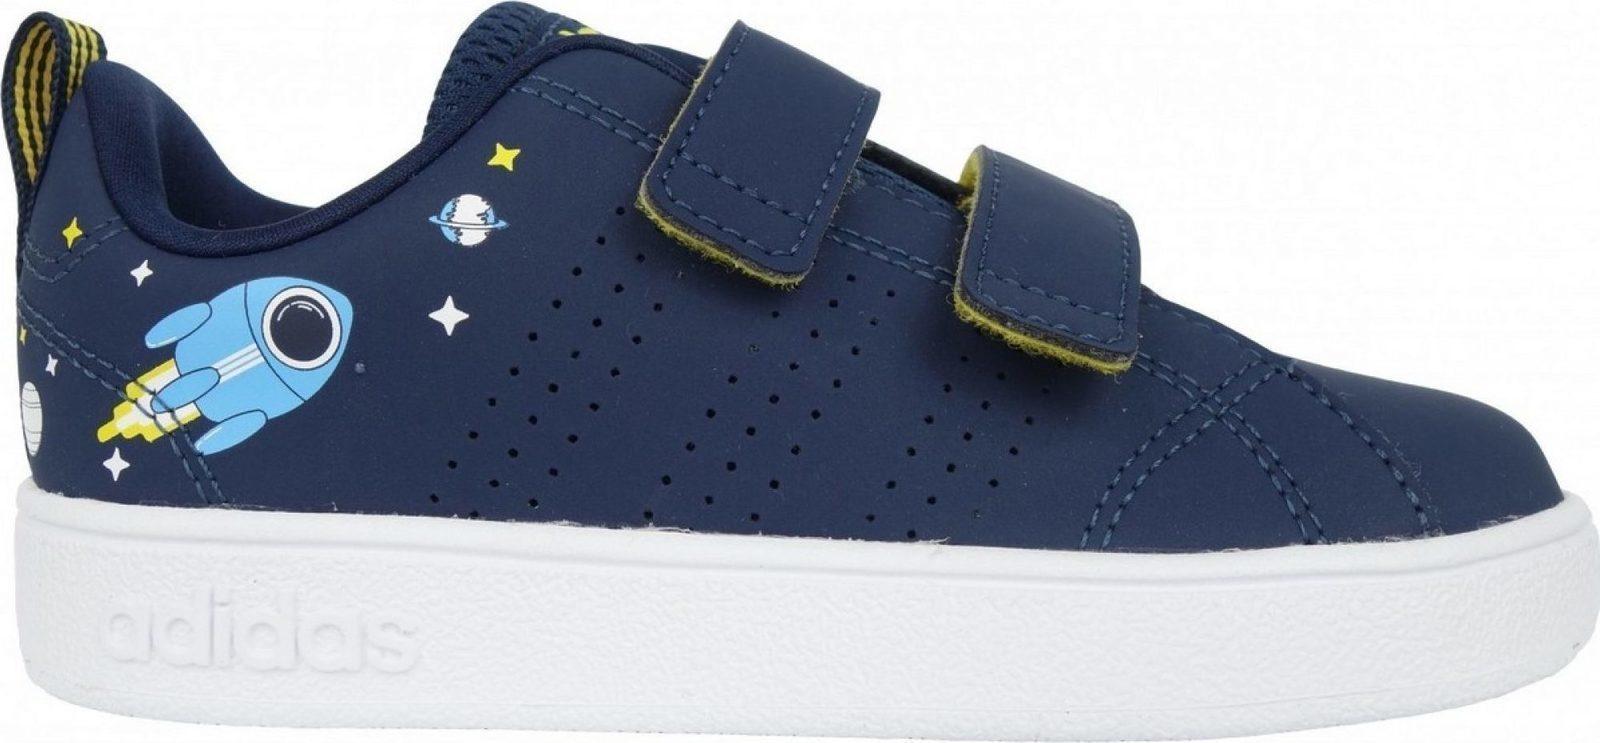 sports shoes efba3 6f36c Προσθήκη στα αγαπημένα menu Adidas VS Advantage Clean CMF INF